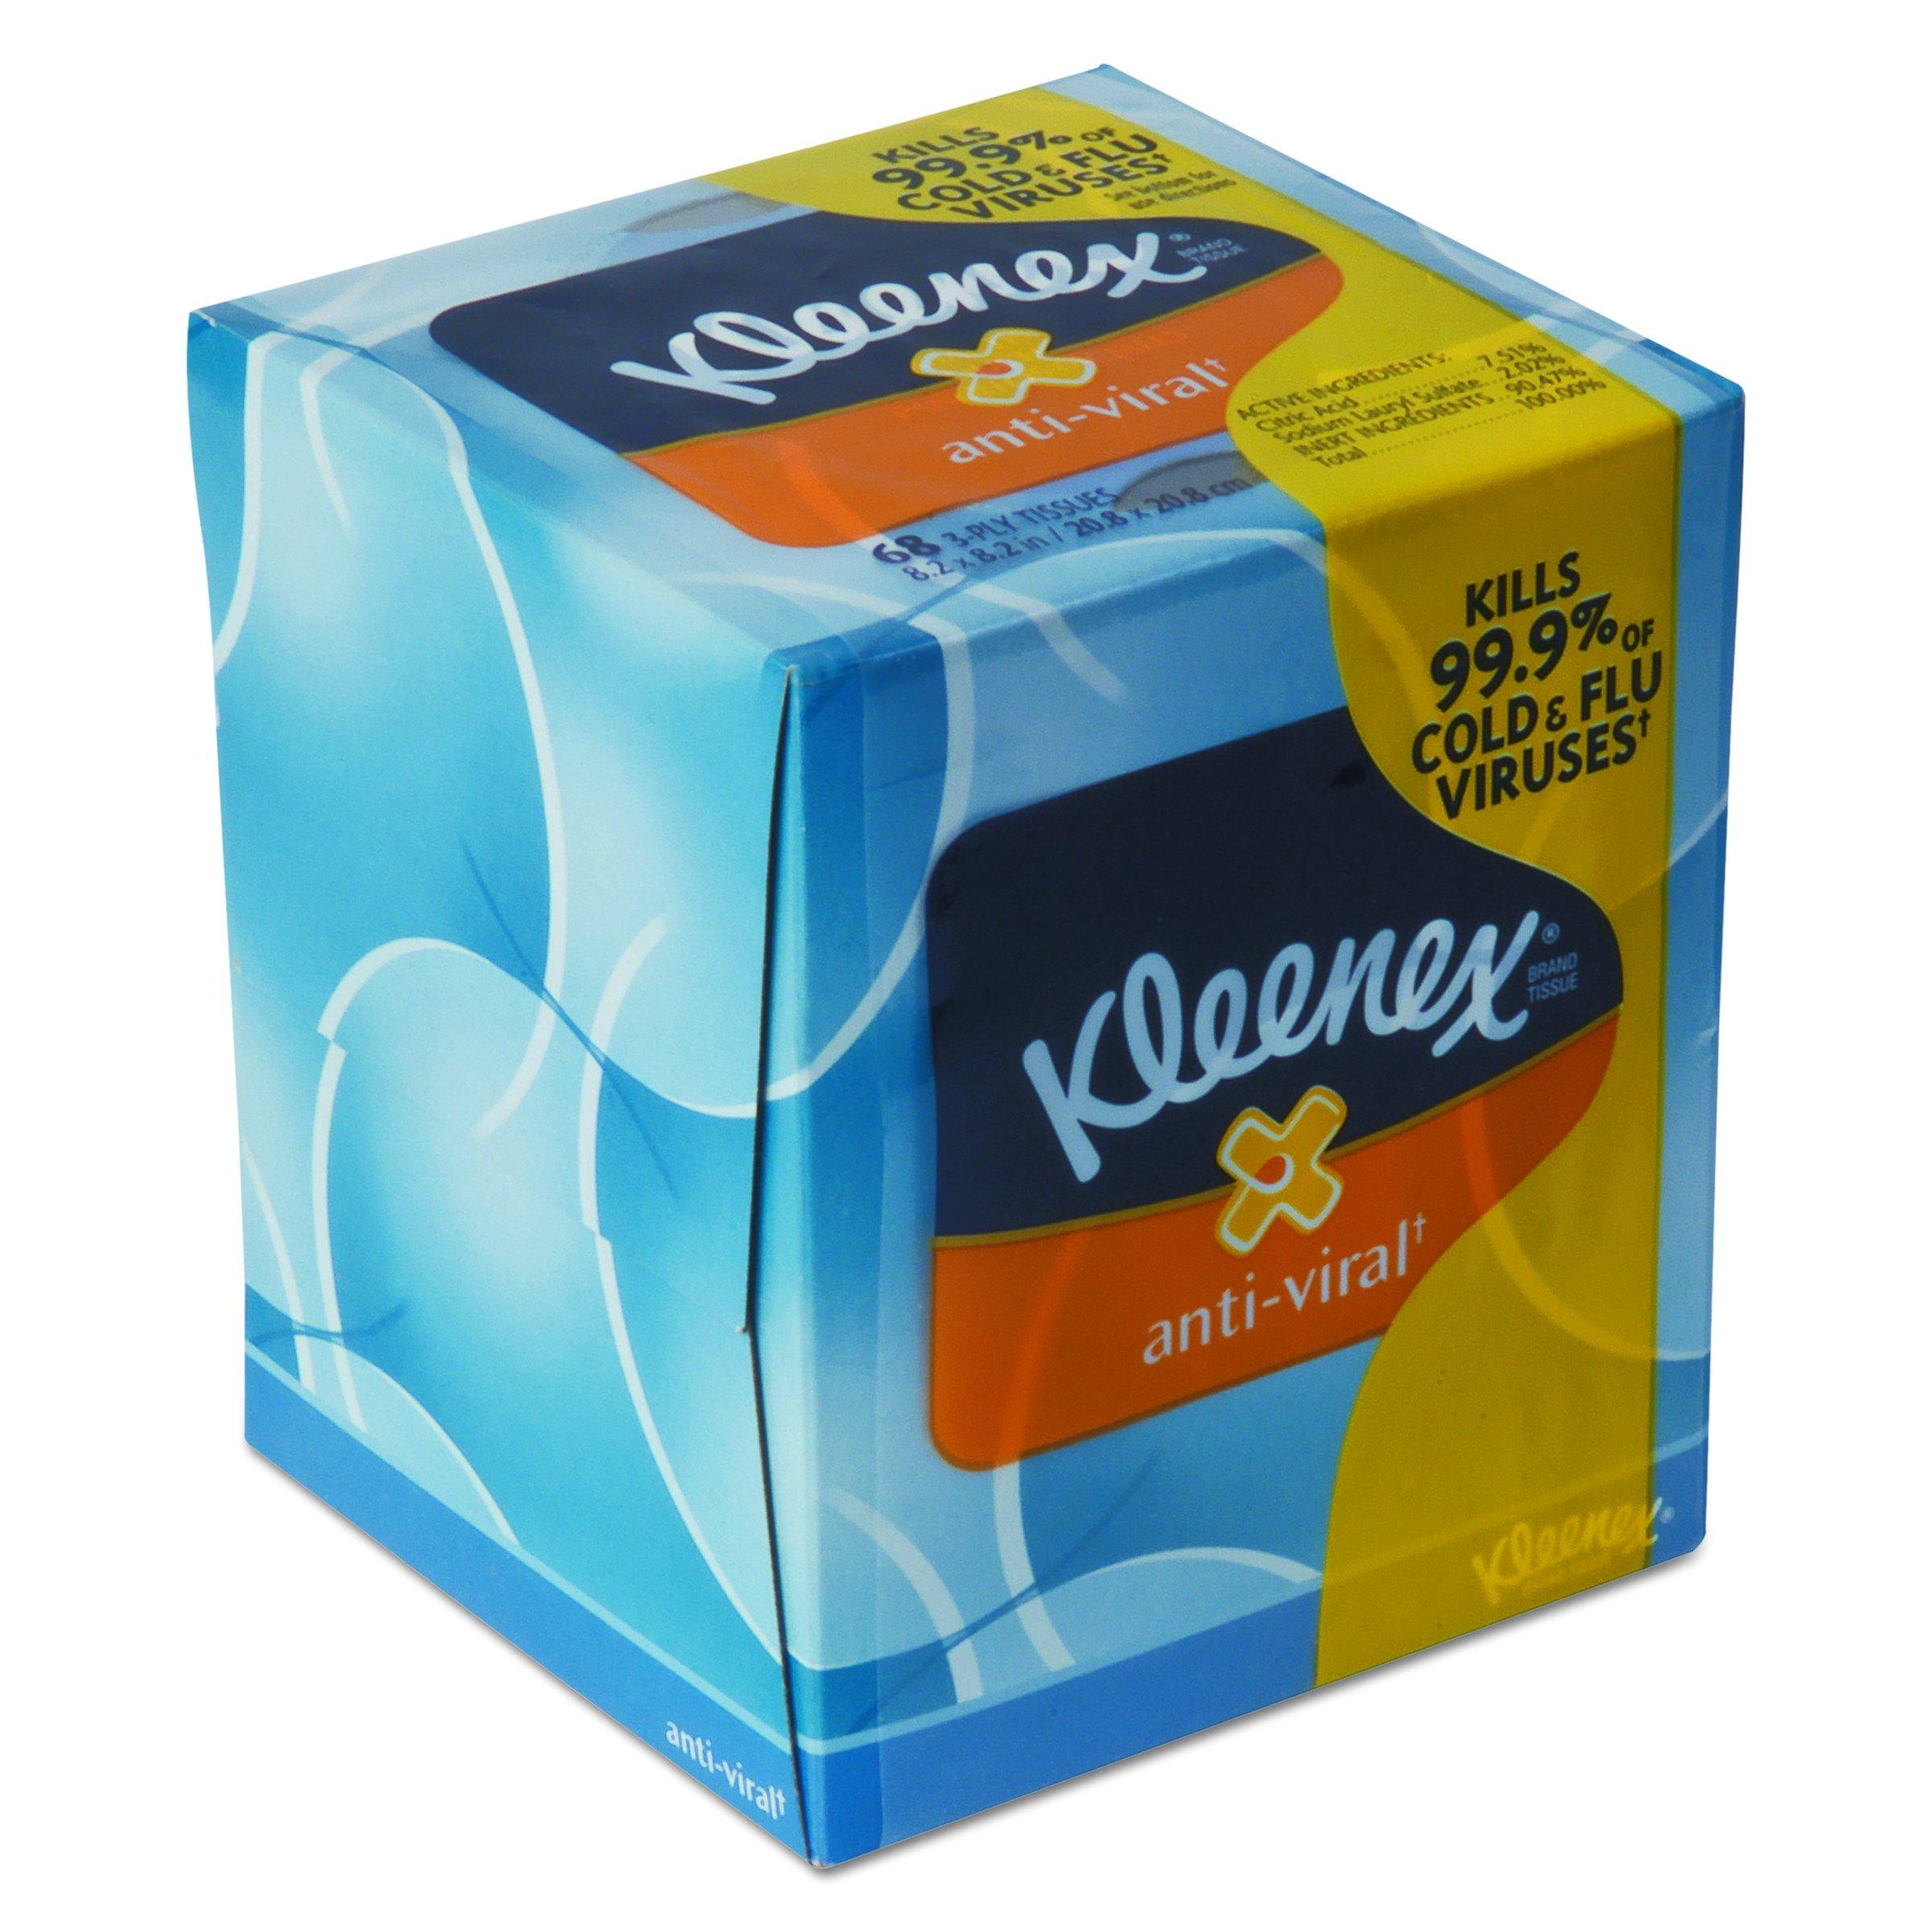 Kleenex Scott 37303CT Anti-Viral Facial Tissue, 3-Ply, 68 Sheets per Box, White (Pack of 27)